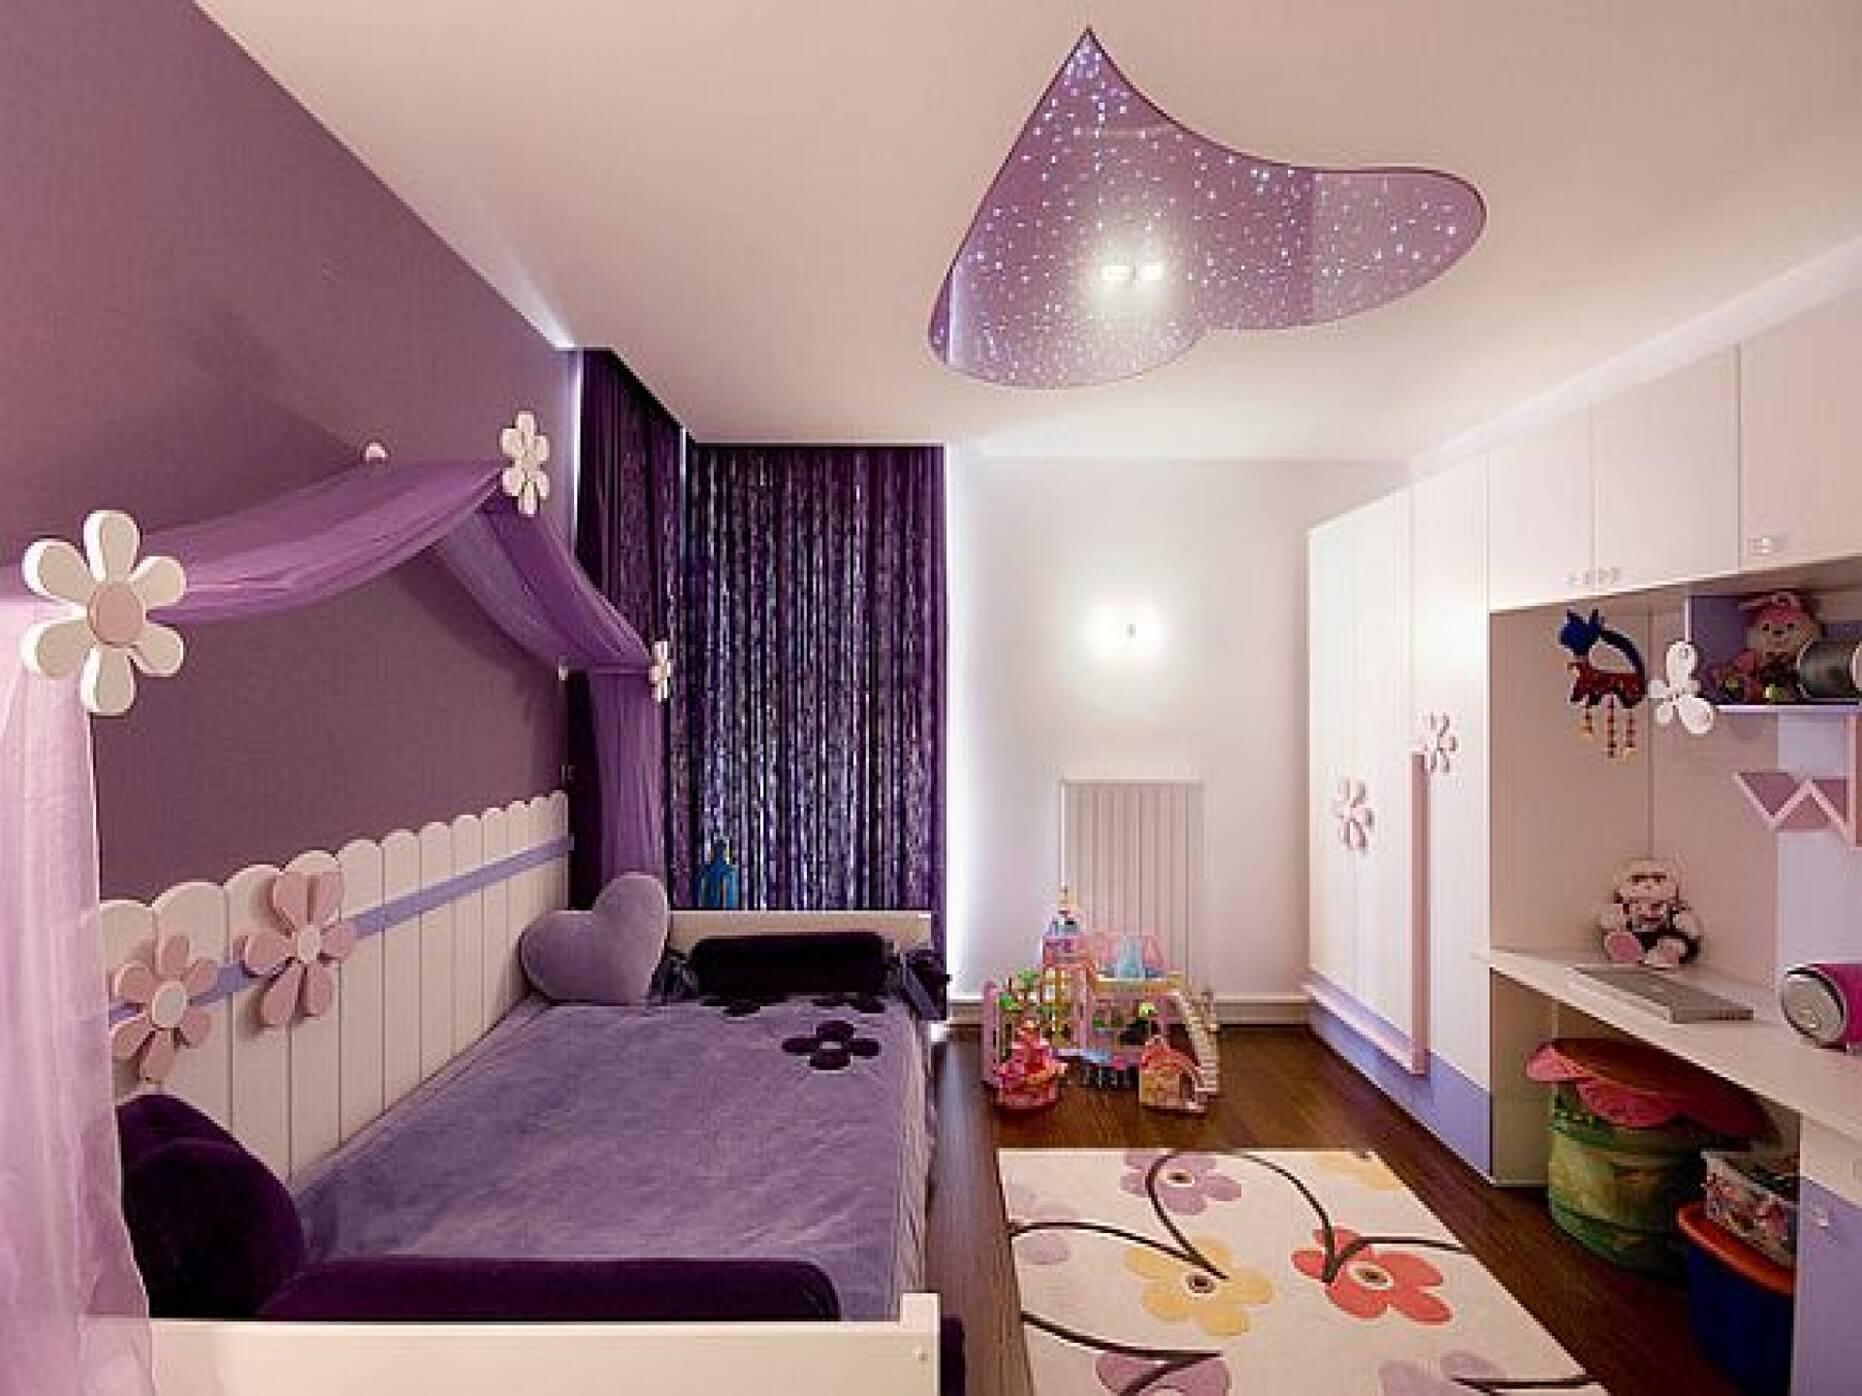 DIY-Bedroom-Decorating-Ideas (1)